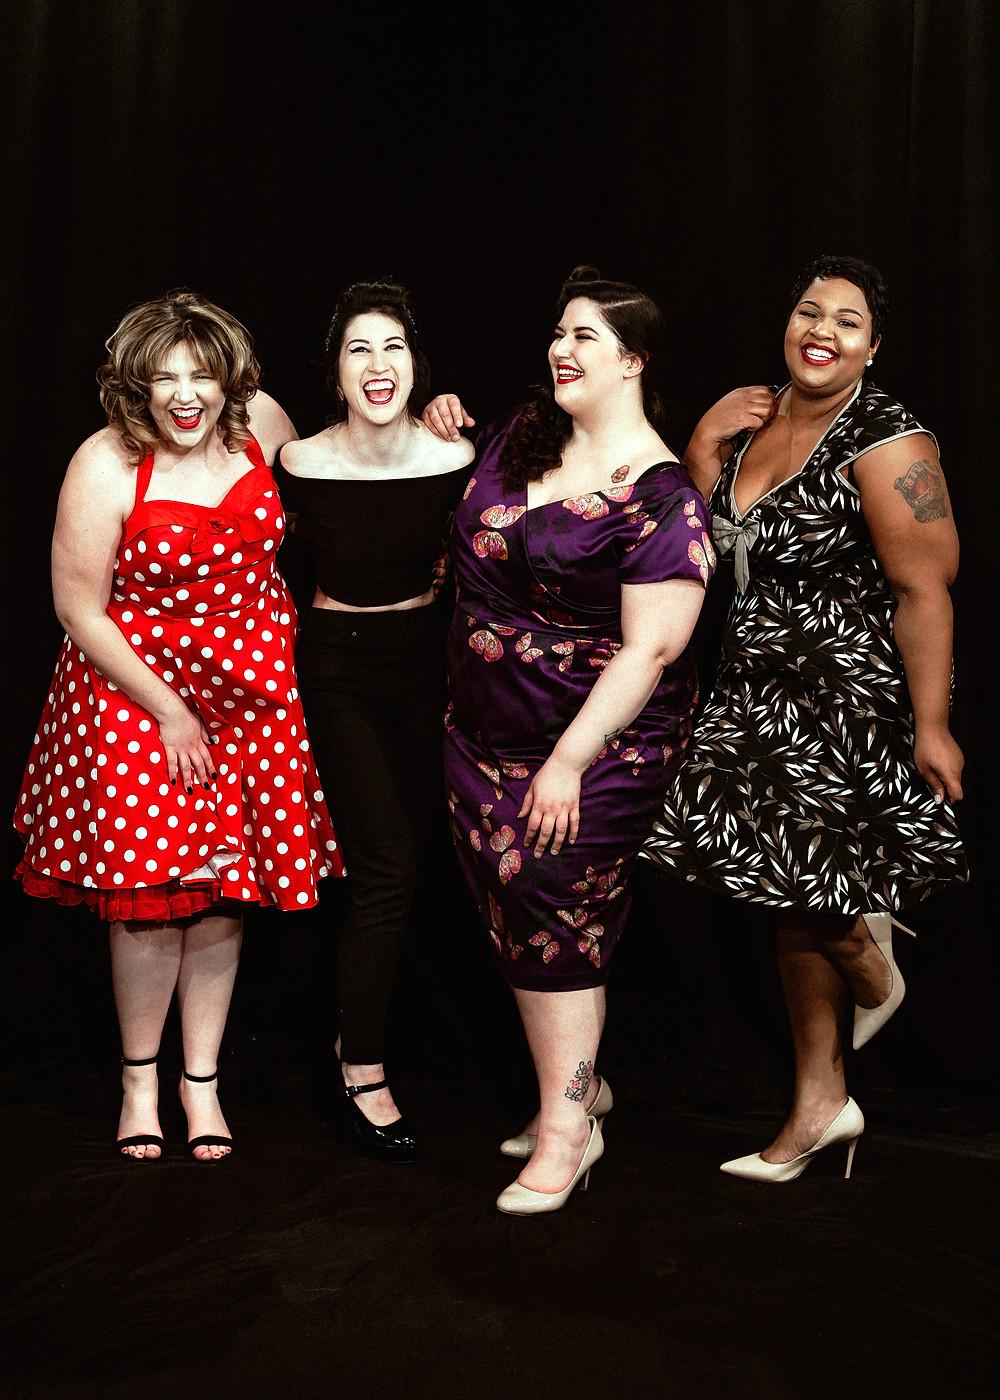 Janie Ruddell, Sophia Wnek, Faith Costa and Catherine Ashly. Photography by John Carlo